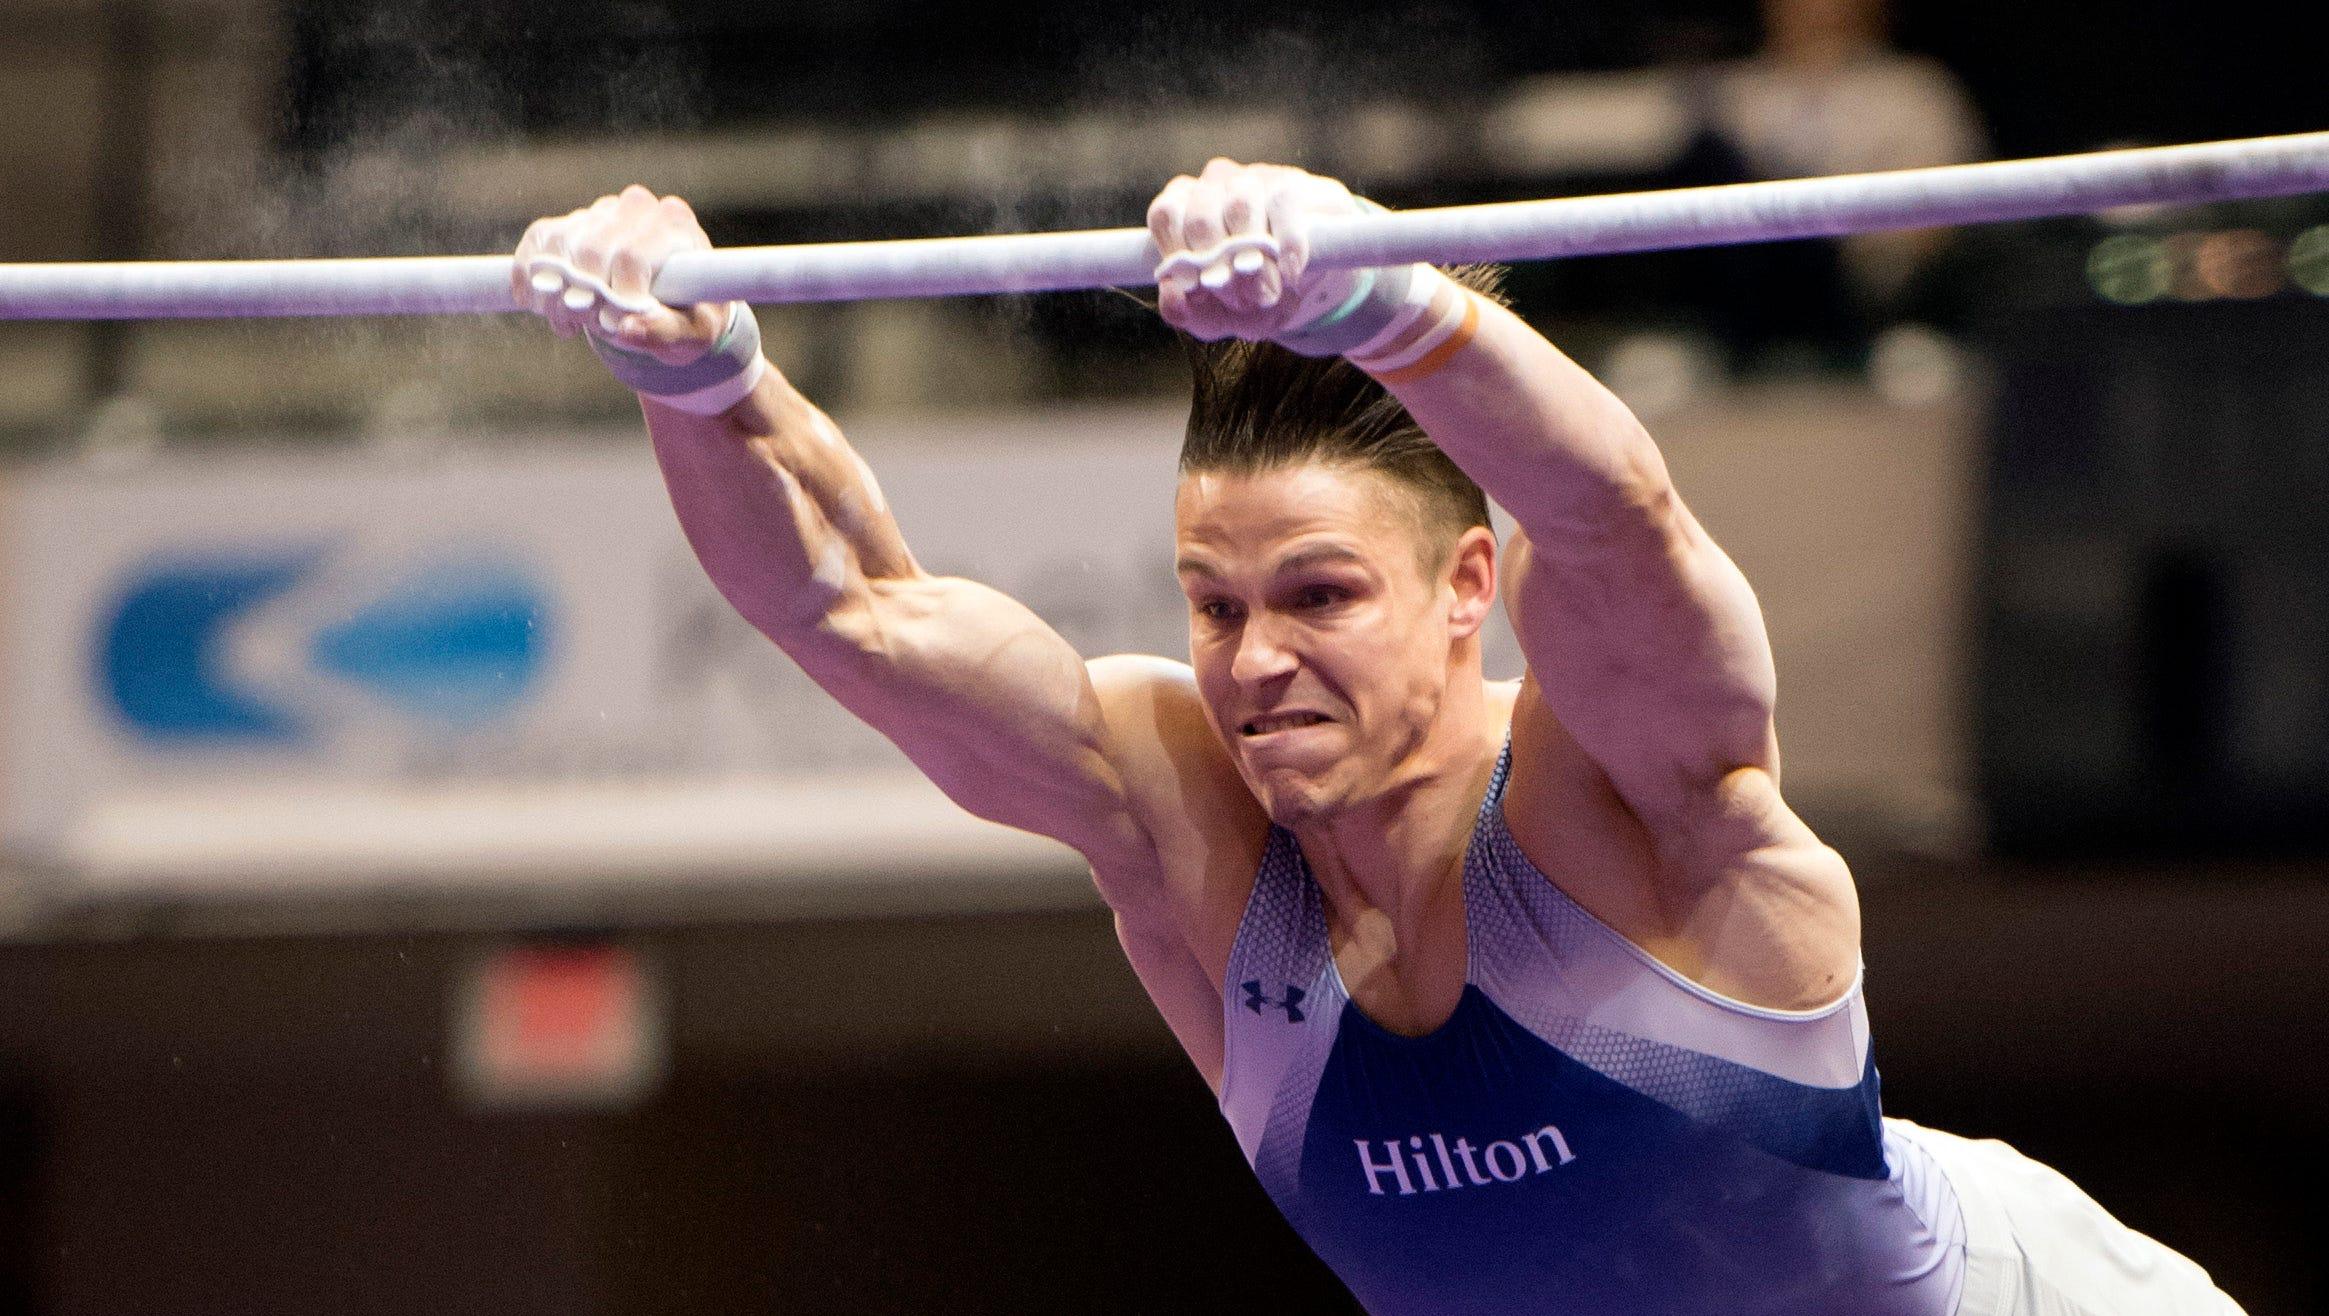 U.S. gymnast Chris Brooks keeps promise to father who died